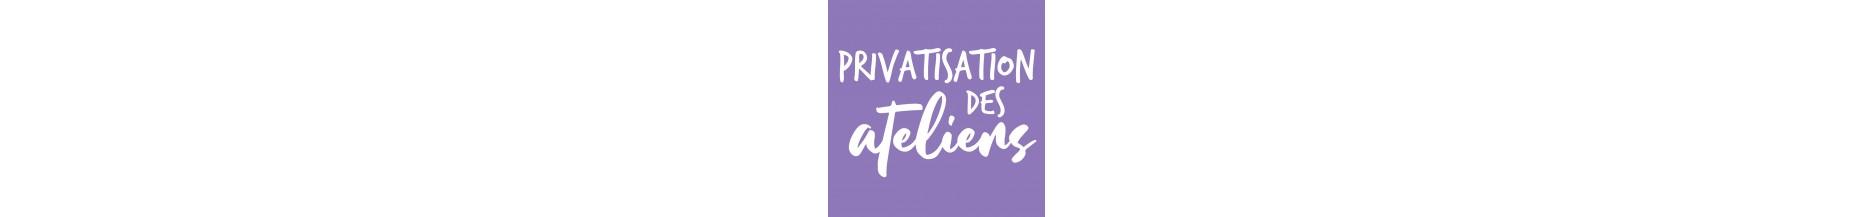 Privatisation des ateliers